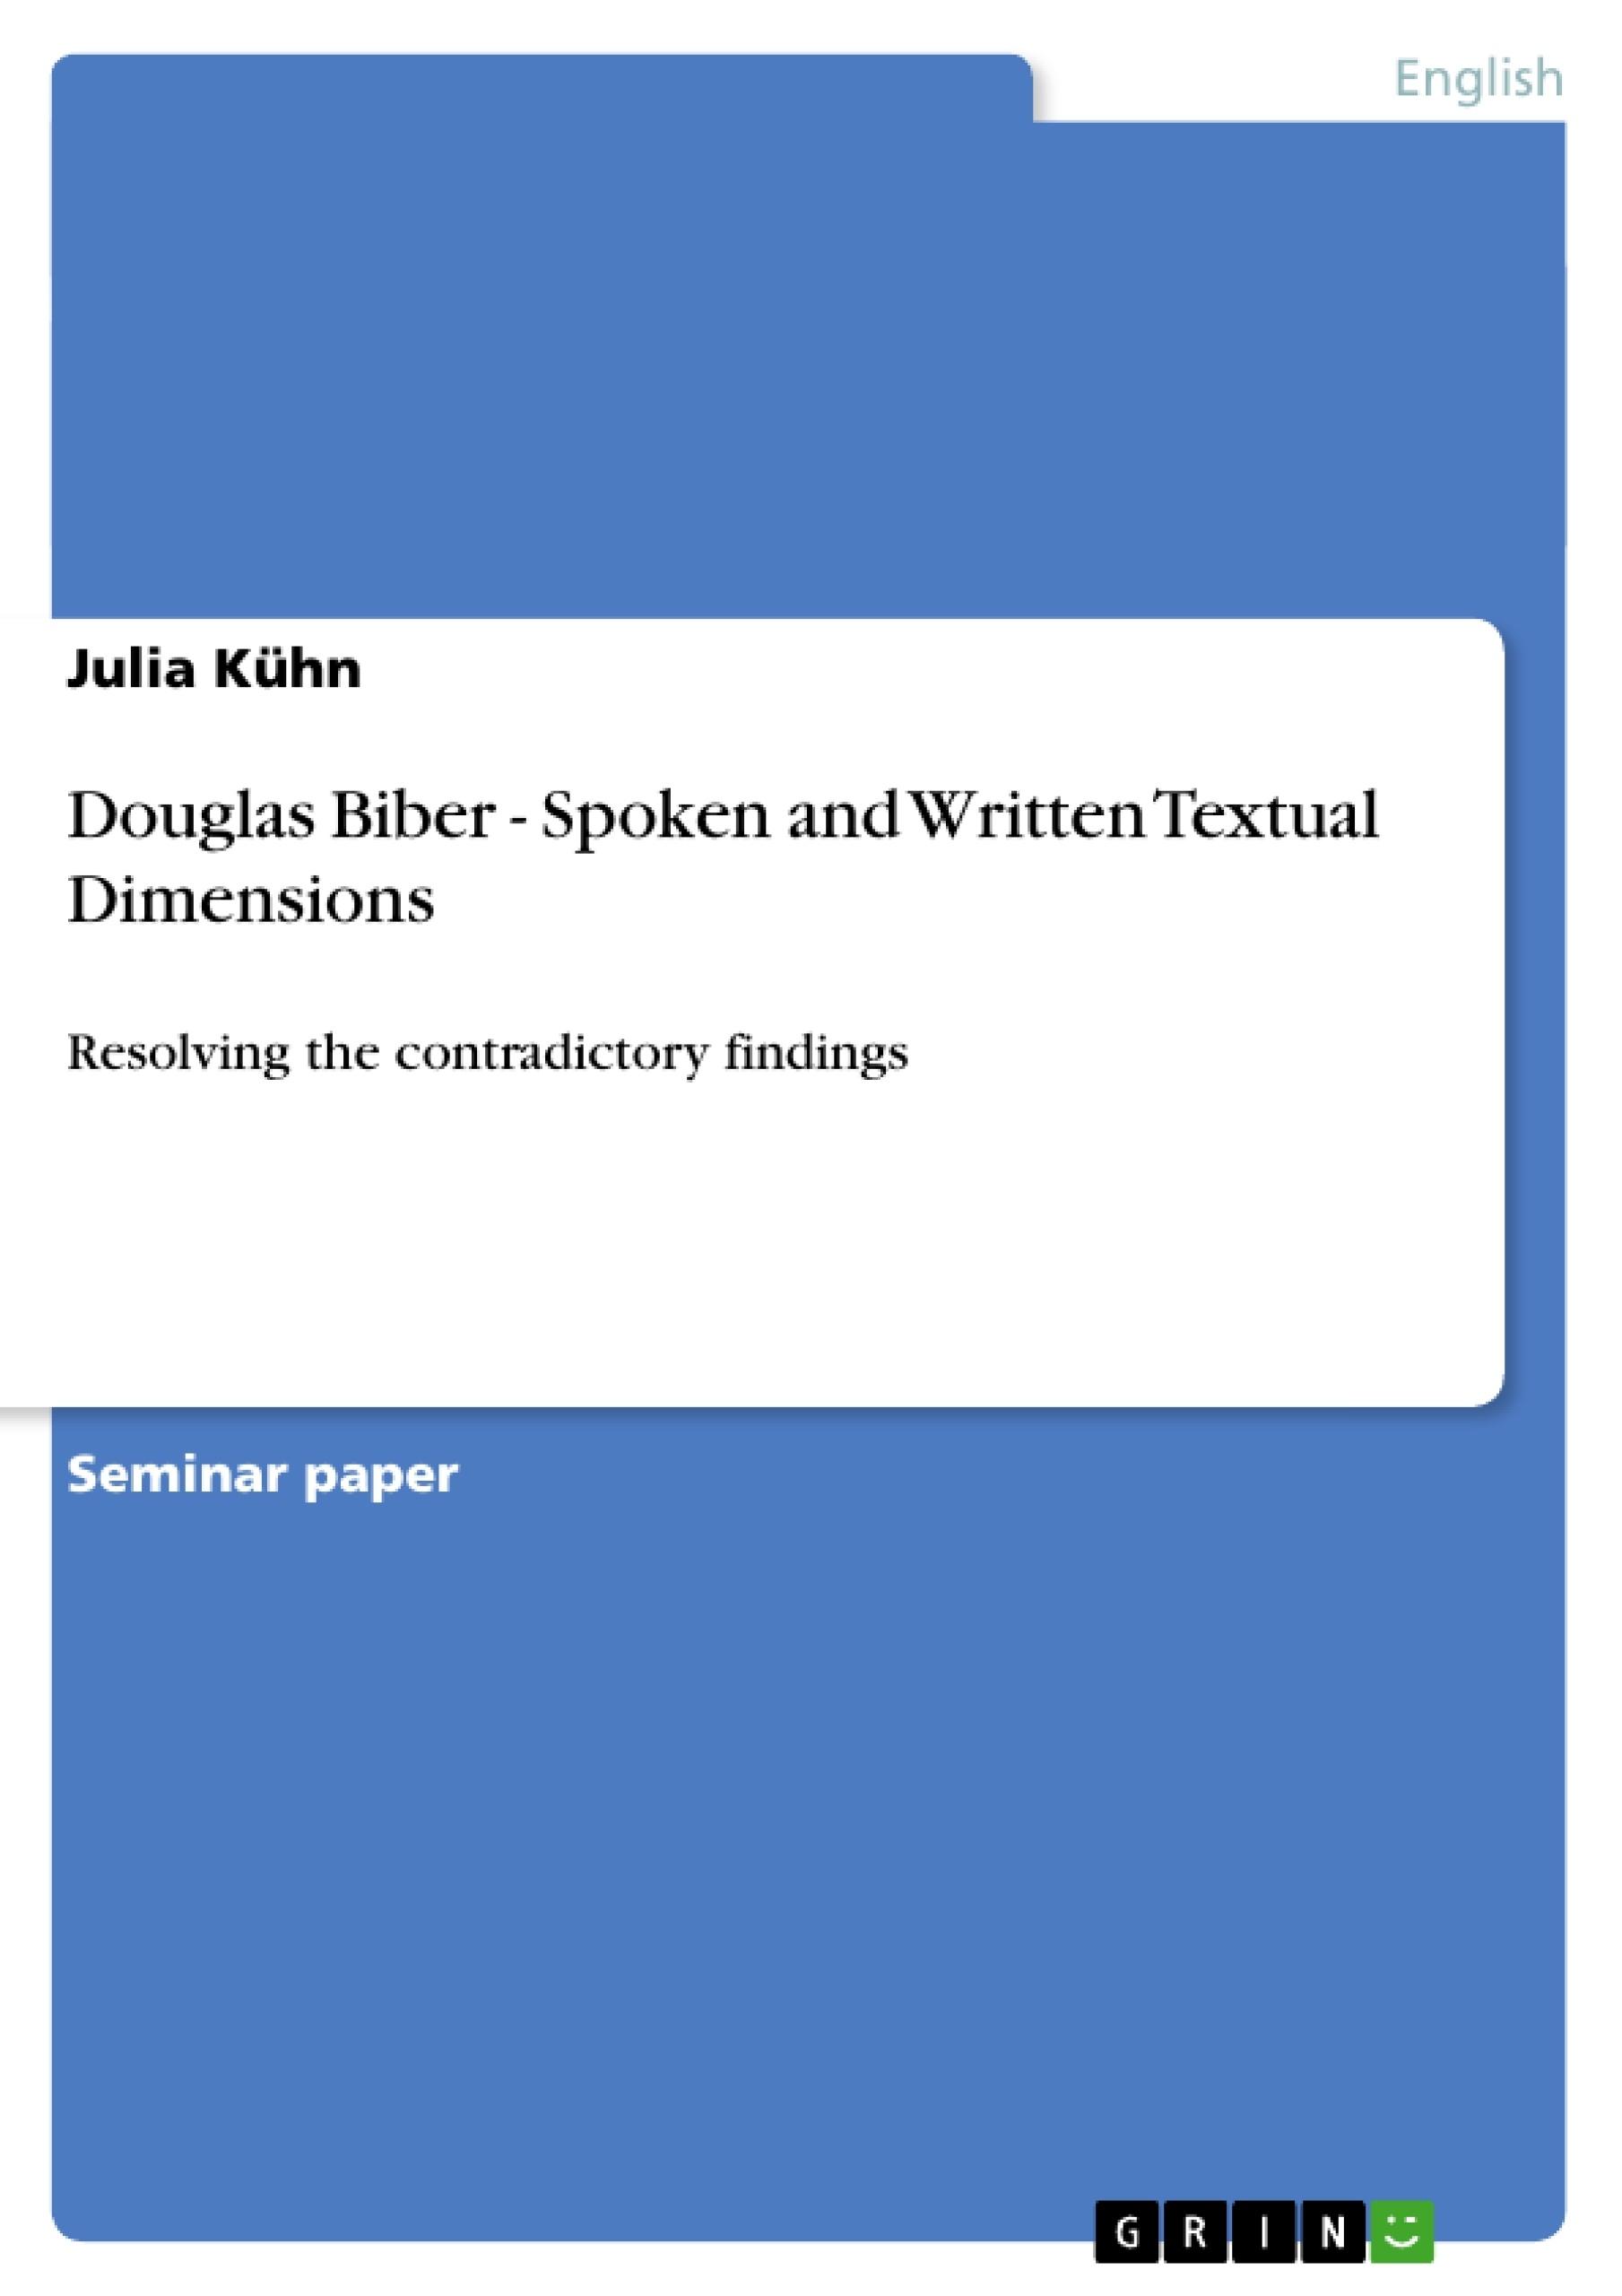 Title: Douglas Biber - Spoken and Written Textual Dimensions